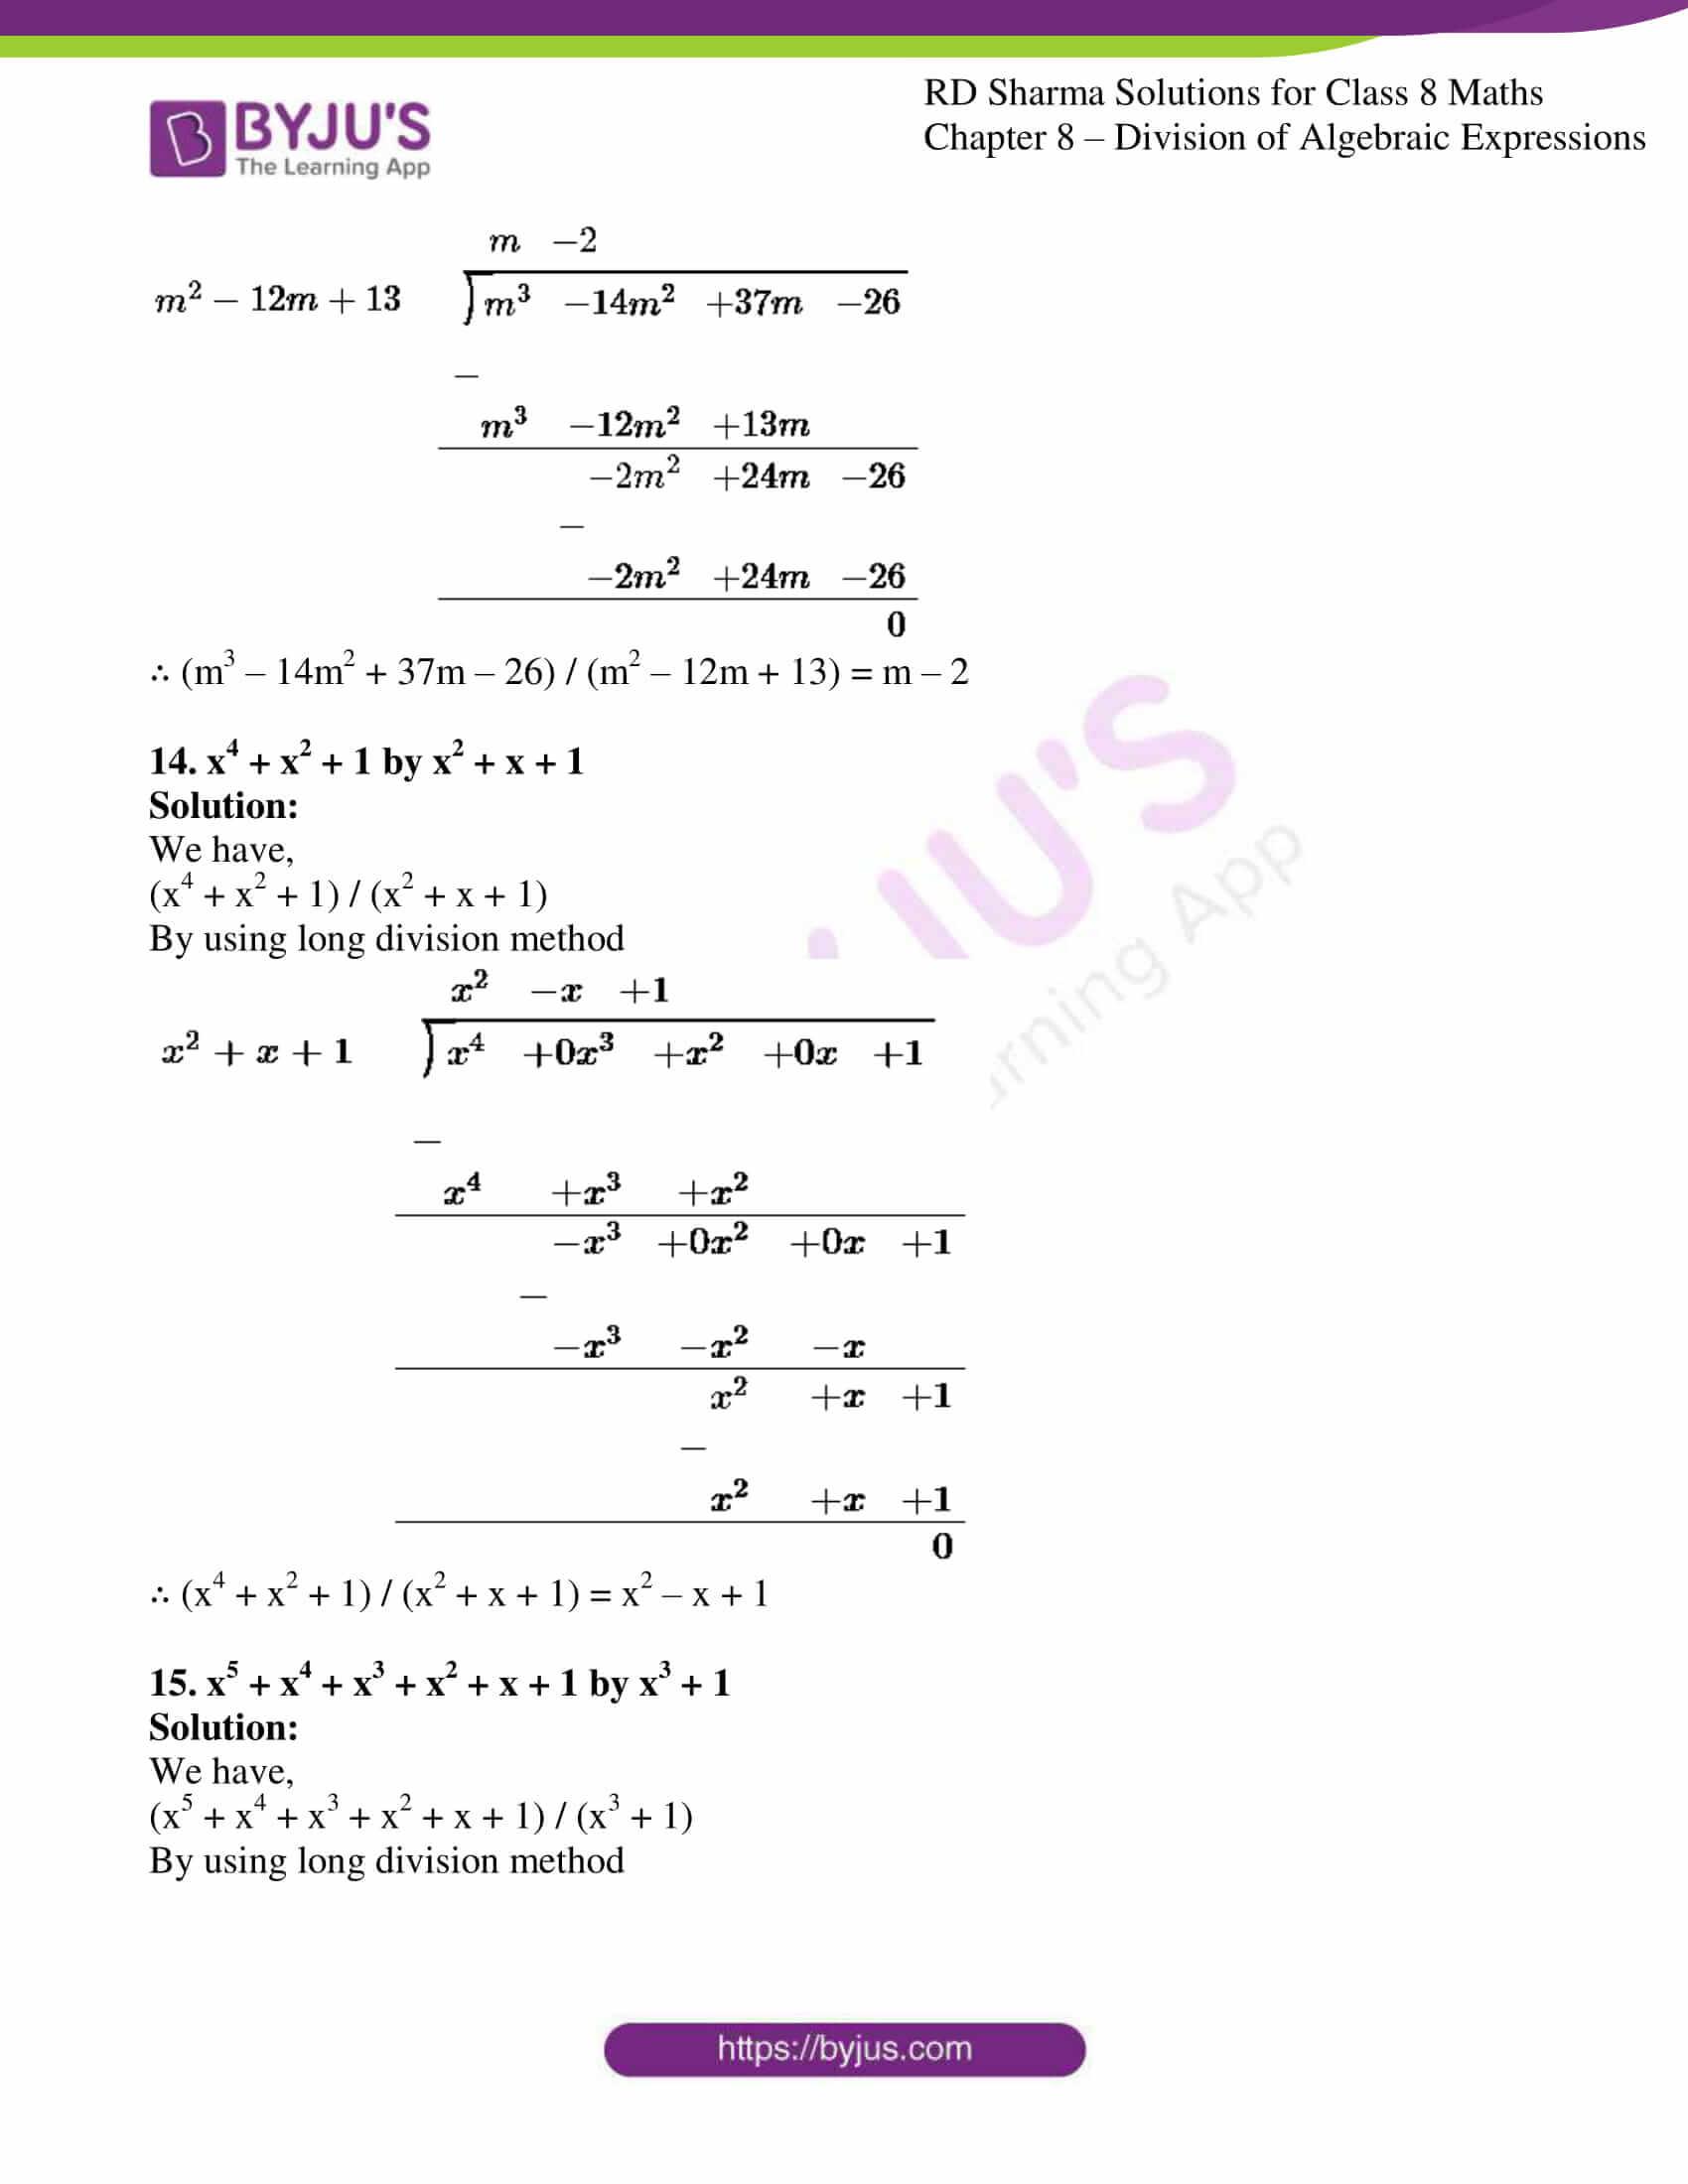 rd sharma class 8 maths chapter 8 exercise 4 06